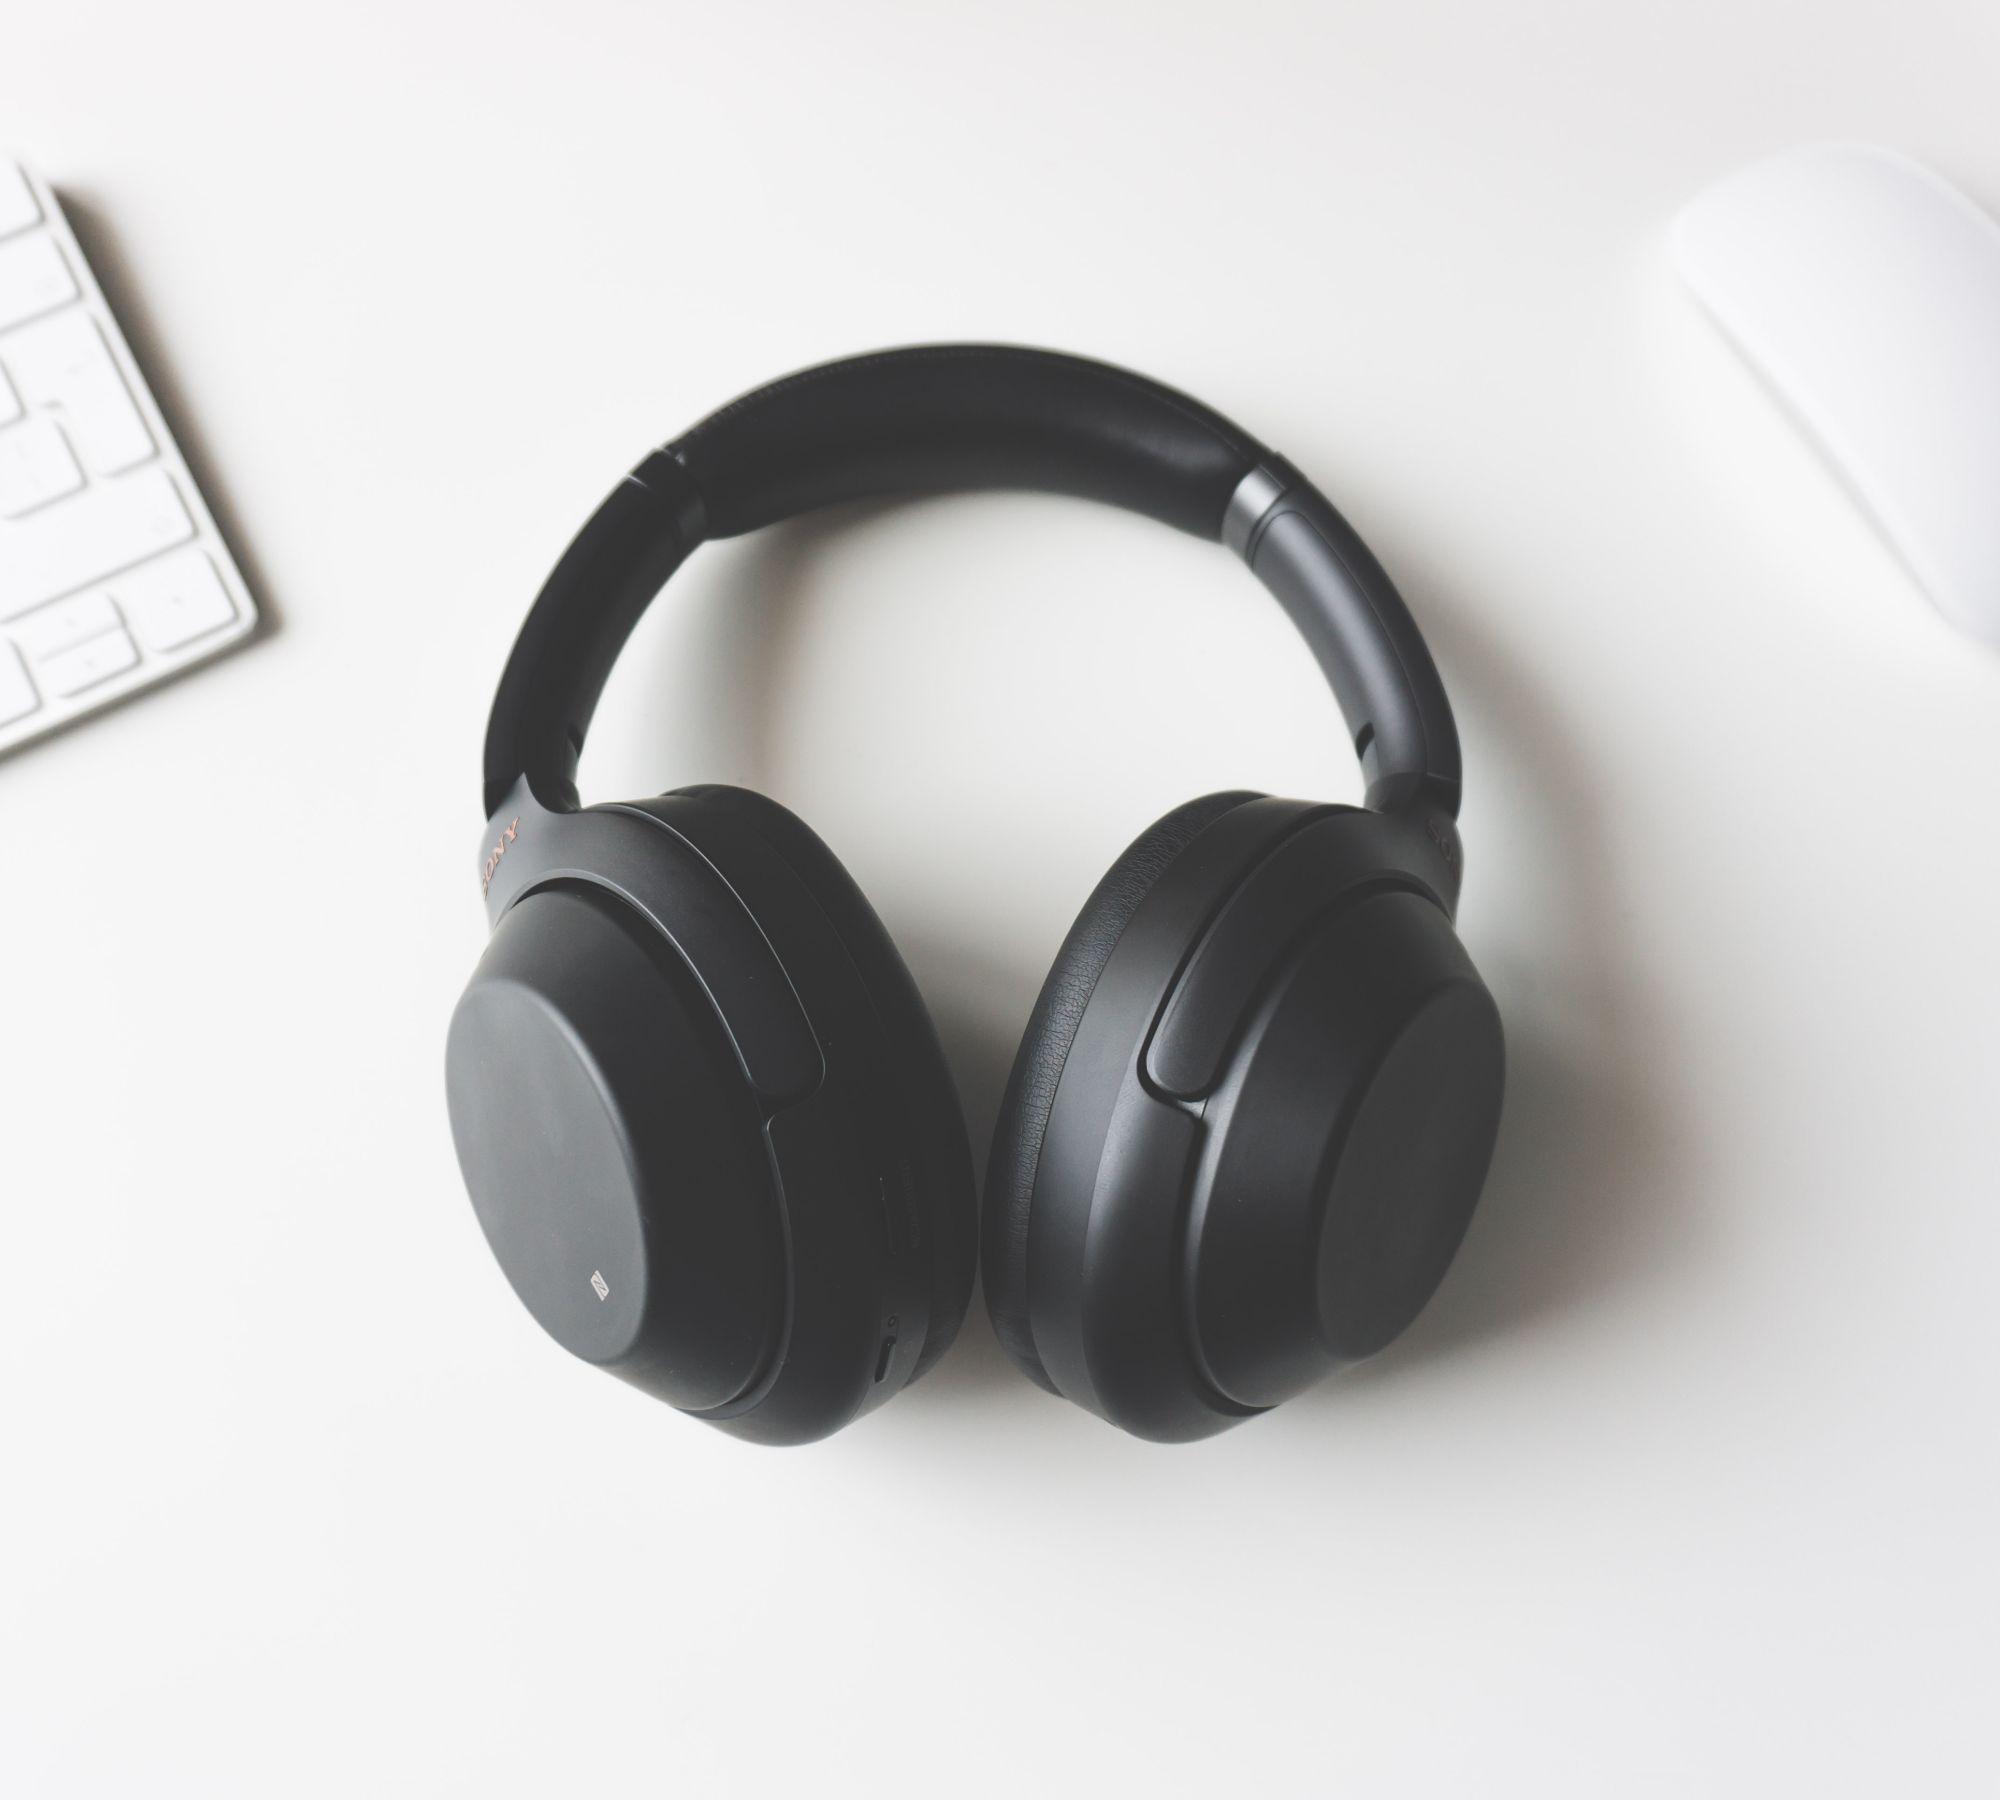 Headphones to capture meeting notes